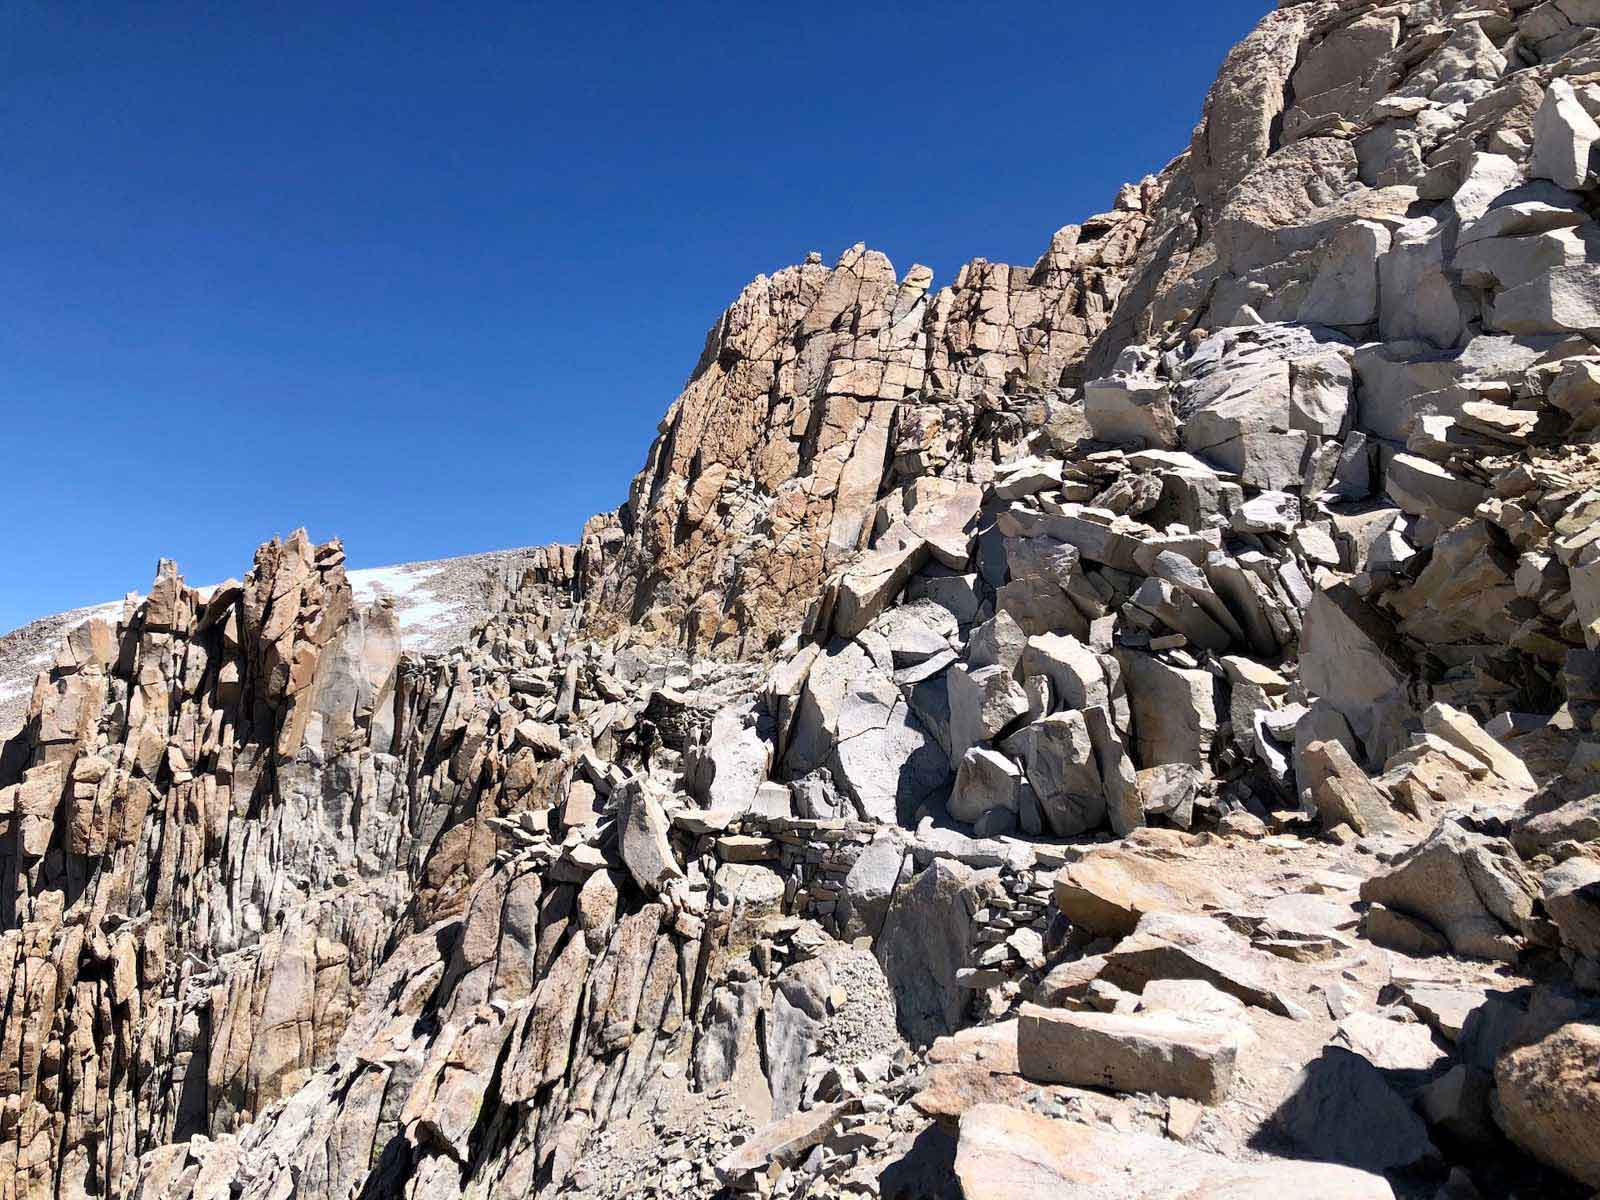 typcial marmot terrain in mountains